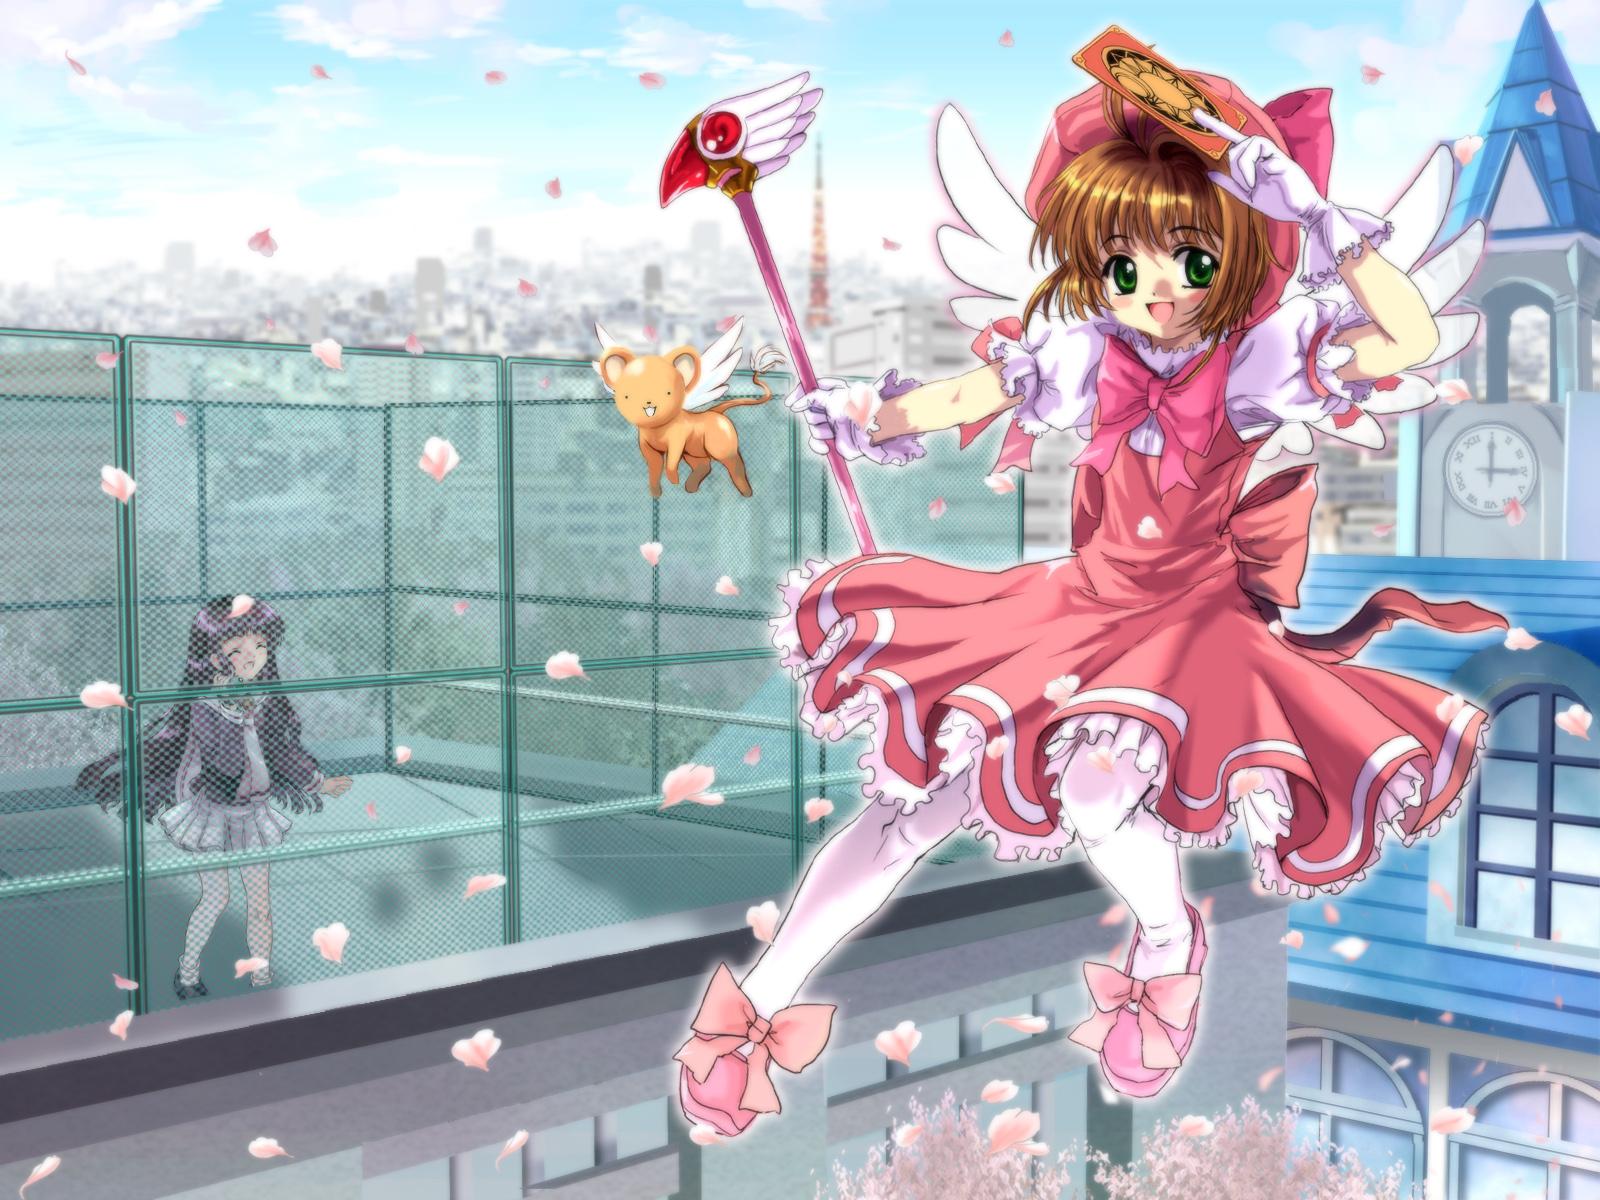 card_captor_sakura cherry_blossoms flowers kero kinomoto_sakura moonknives